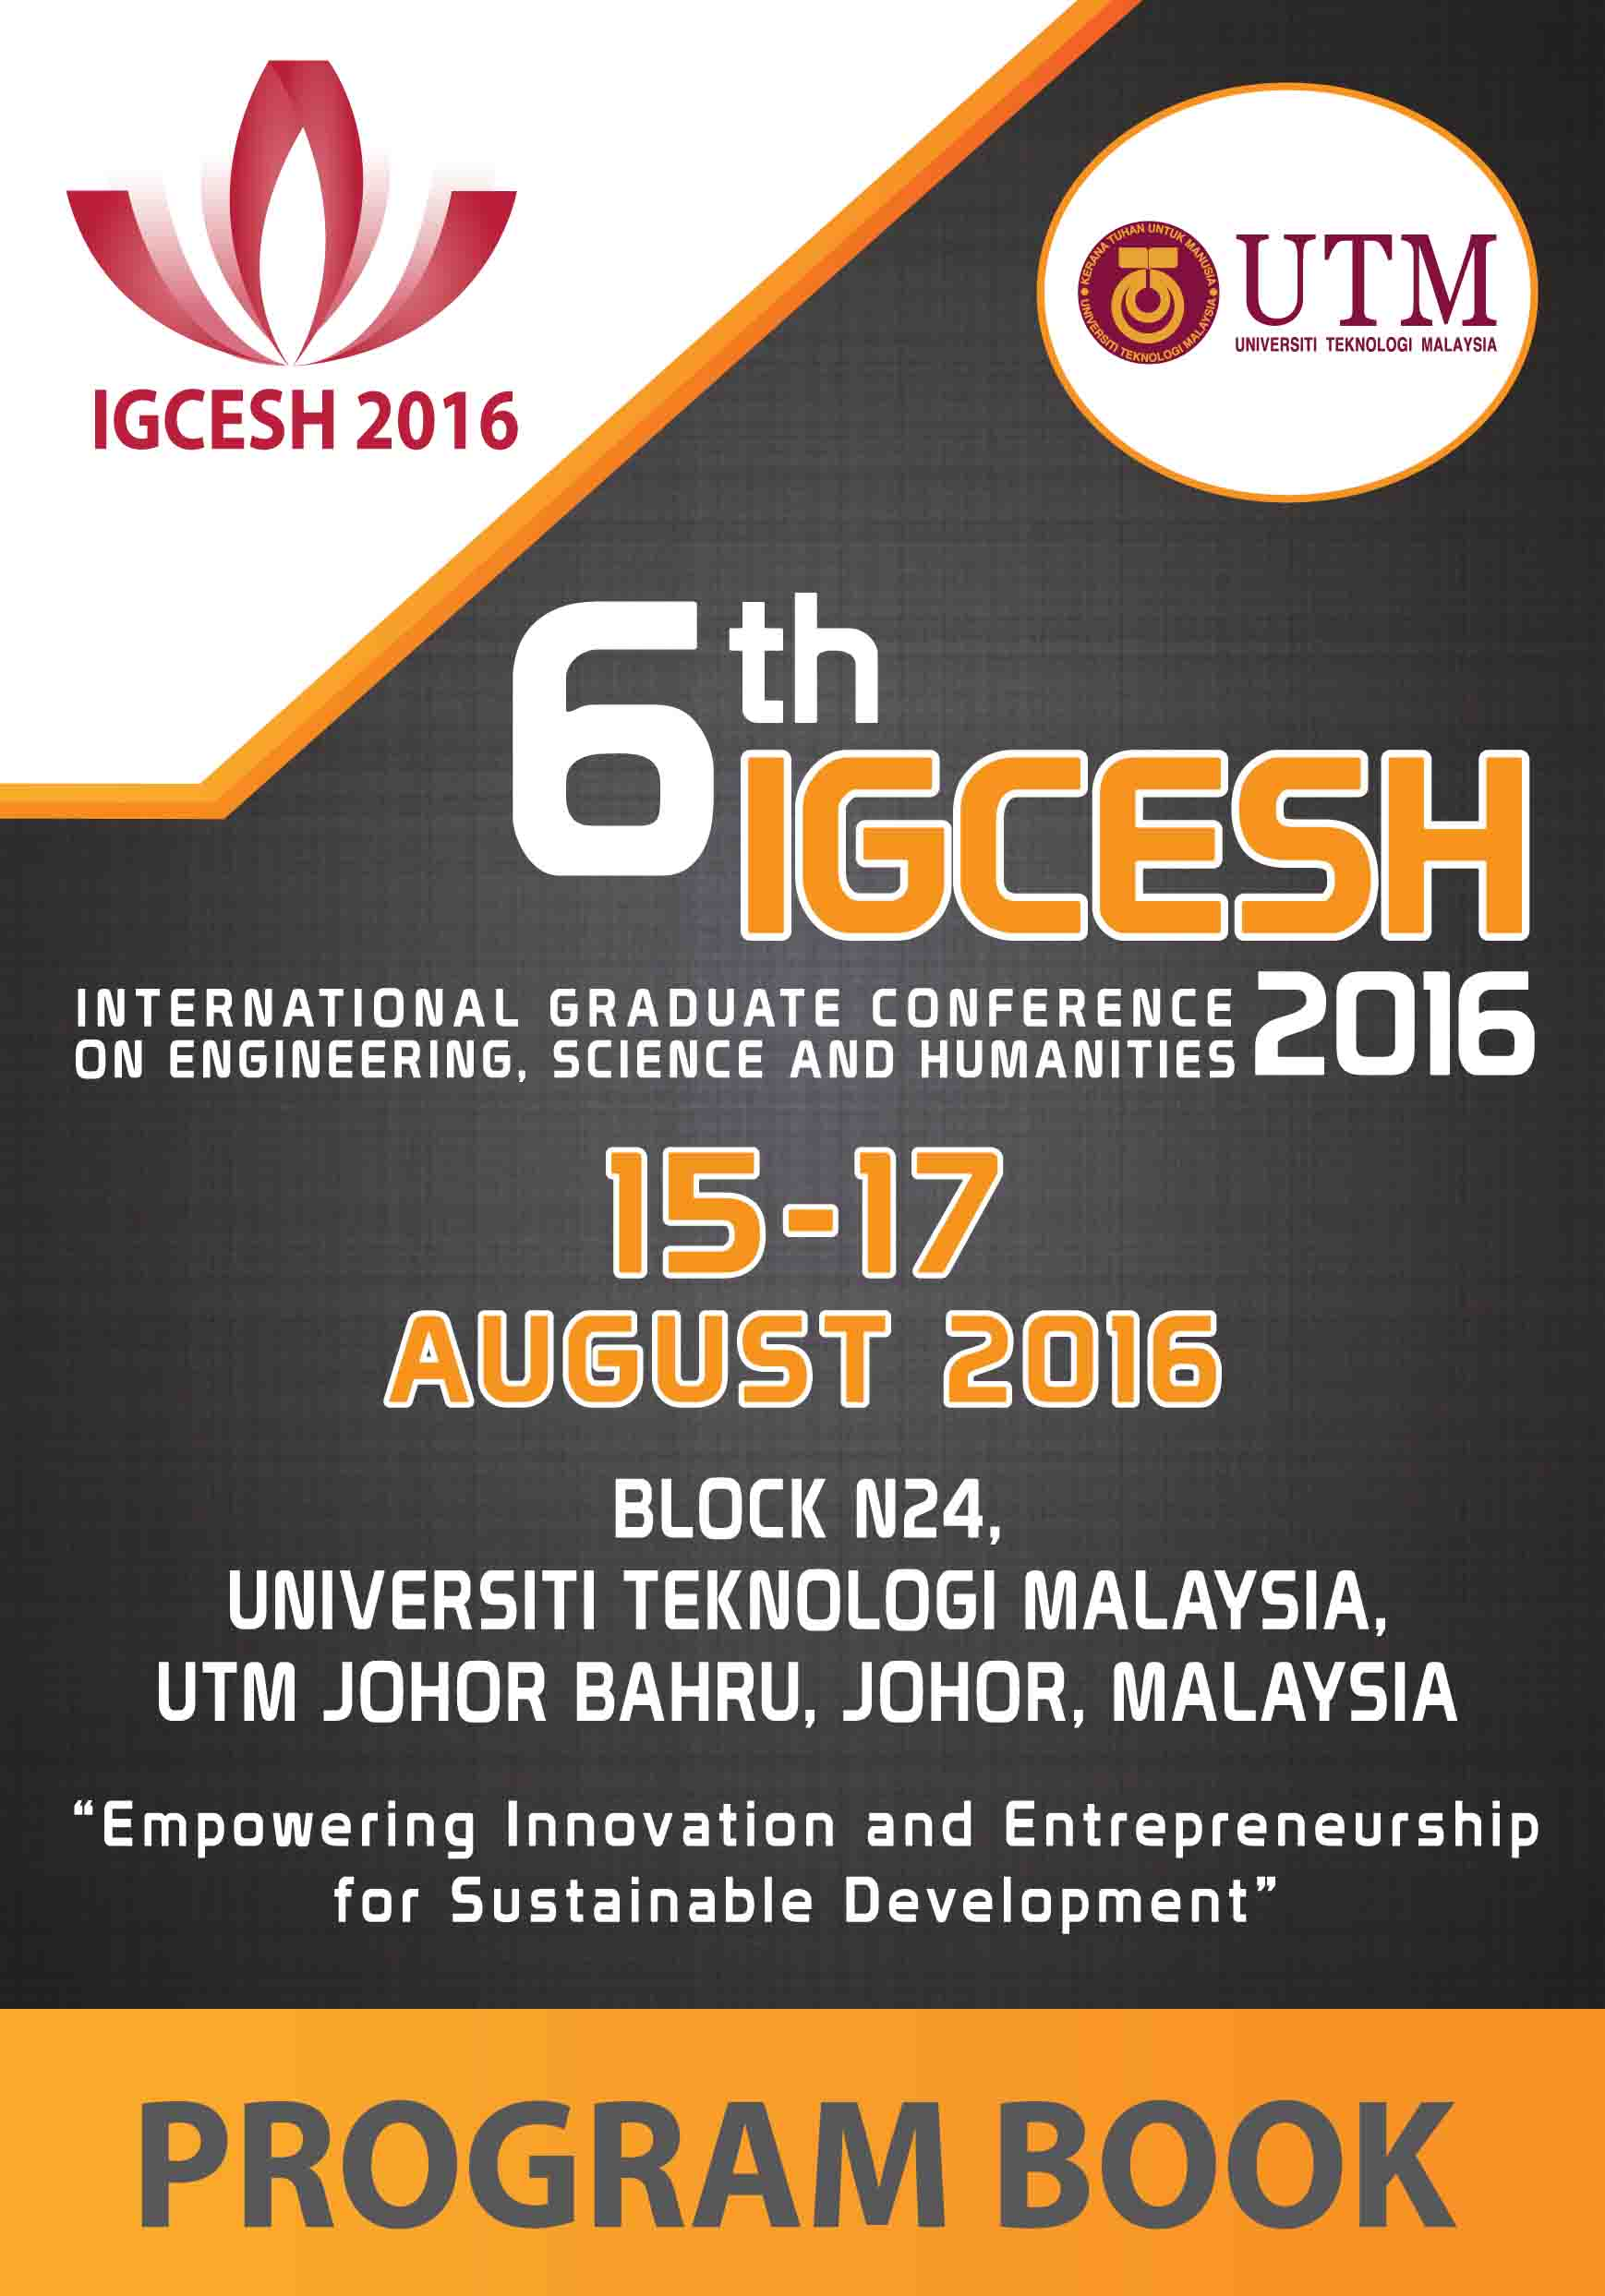 Igcesh2016 cover front program book toneelgroepblik Image collections